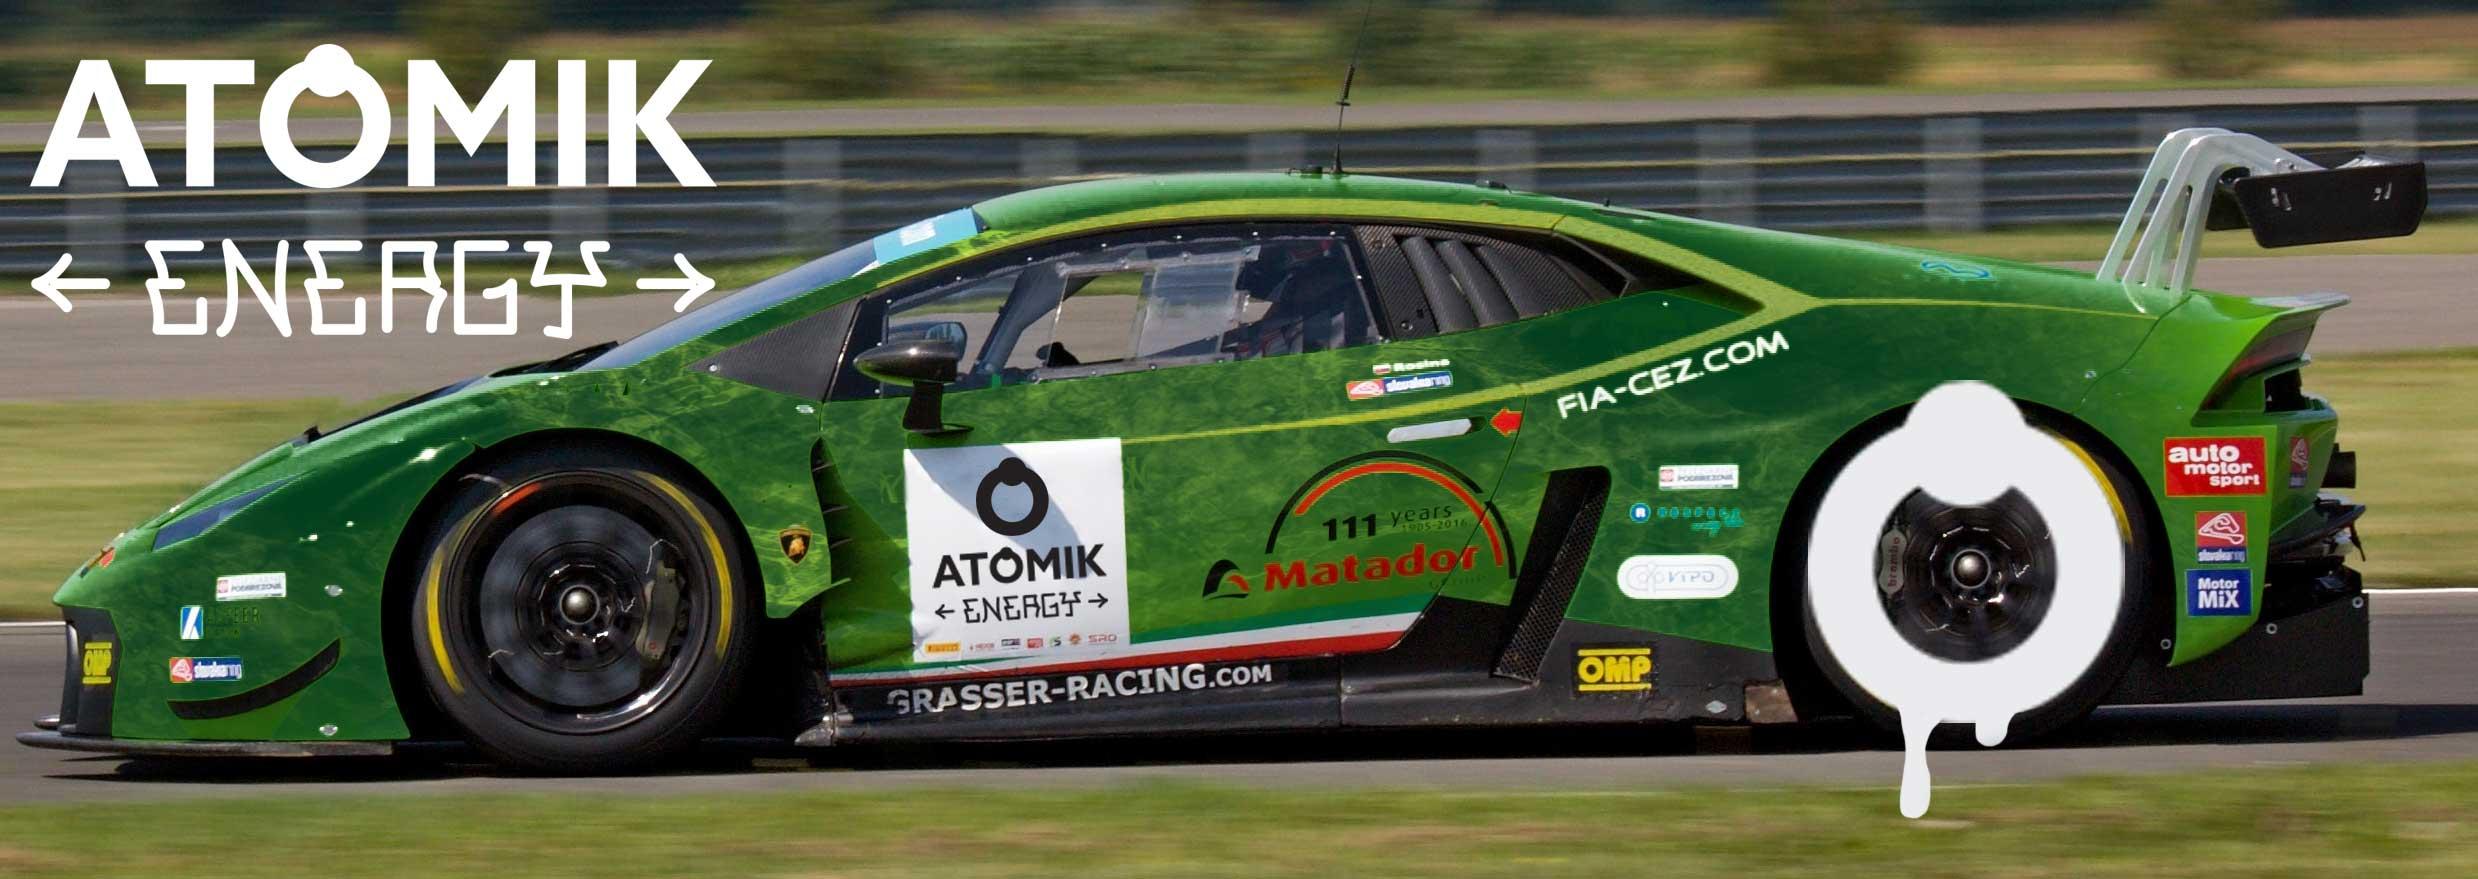 action-auto-racing-car-169176.jpg